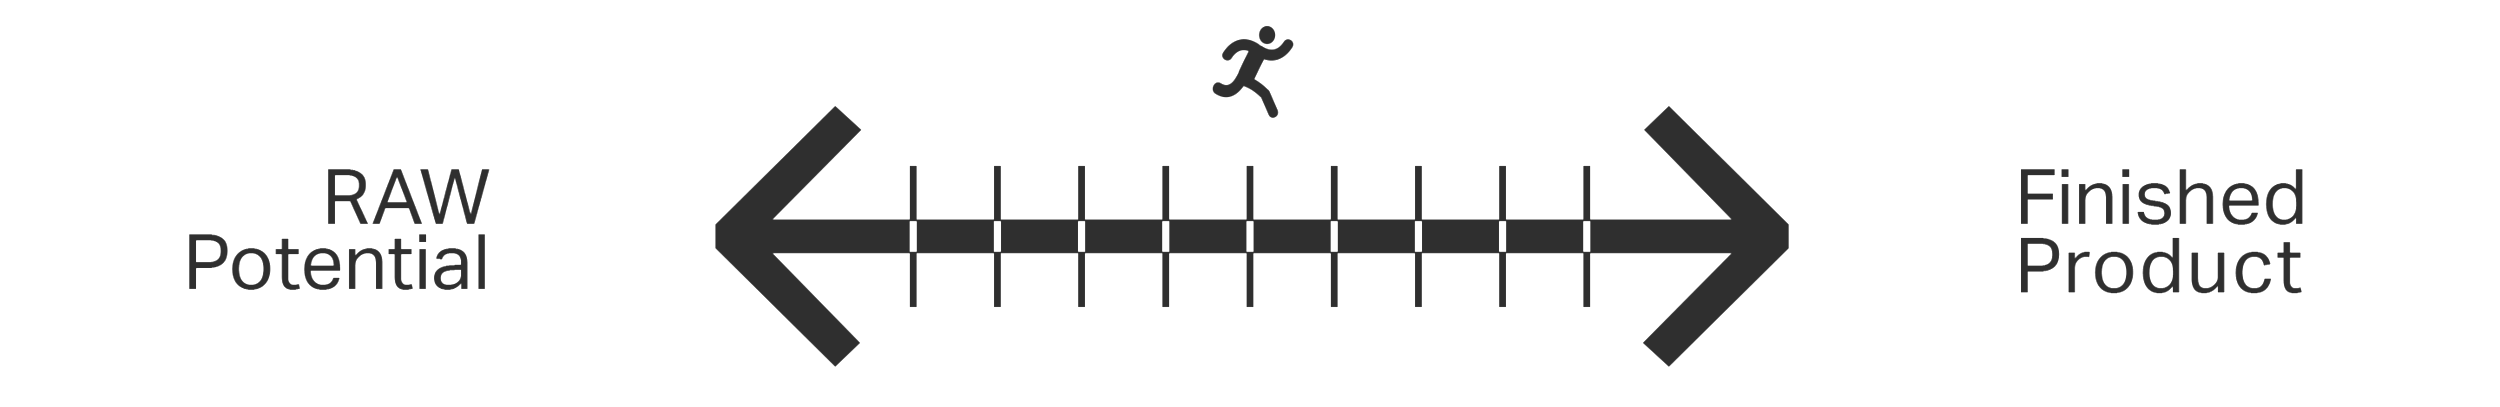 ILUVMFG-process.png